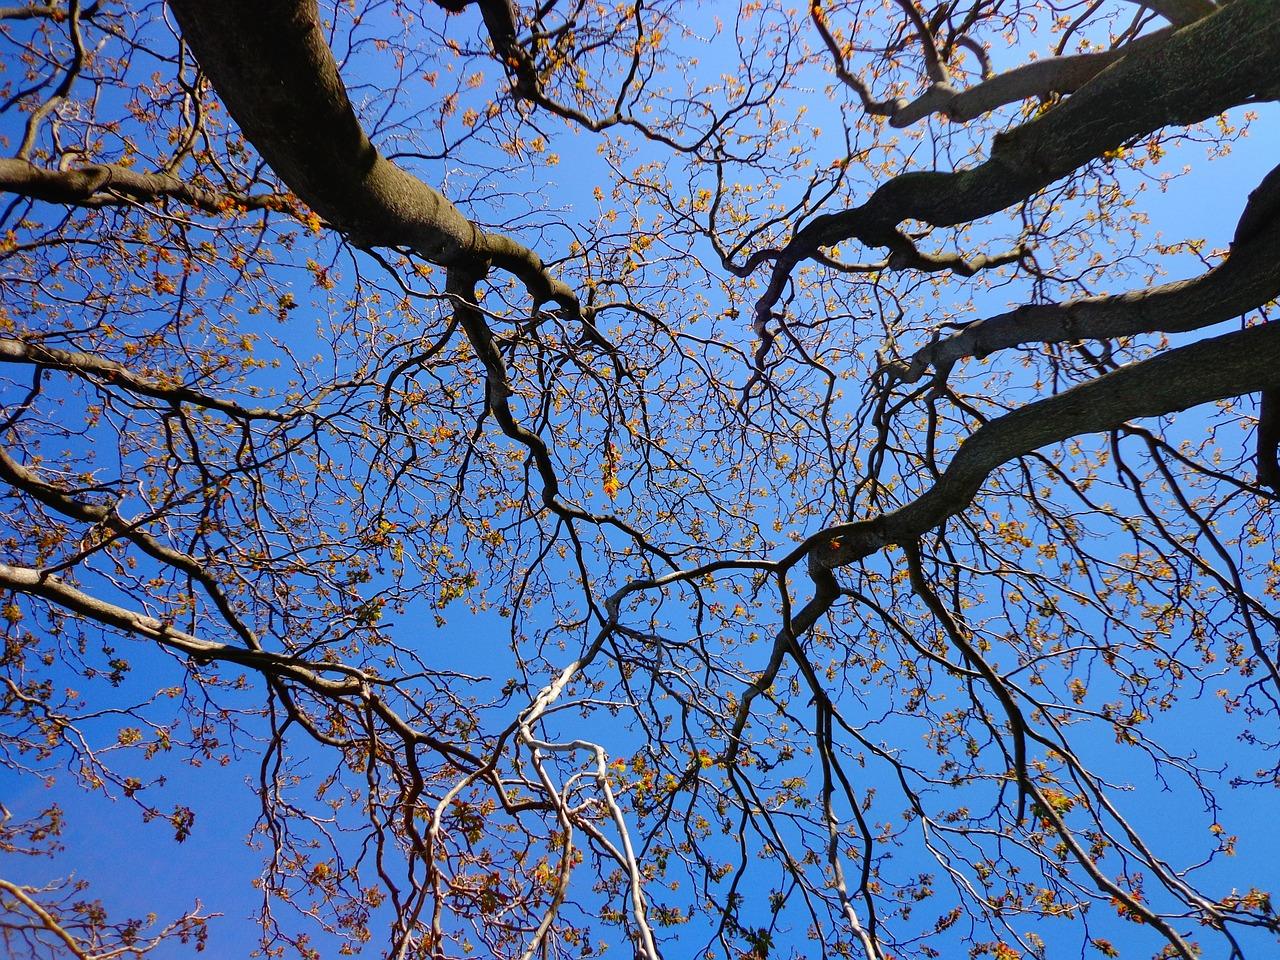 tree-439171_1280.jpg